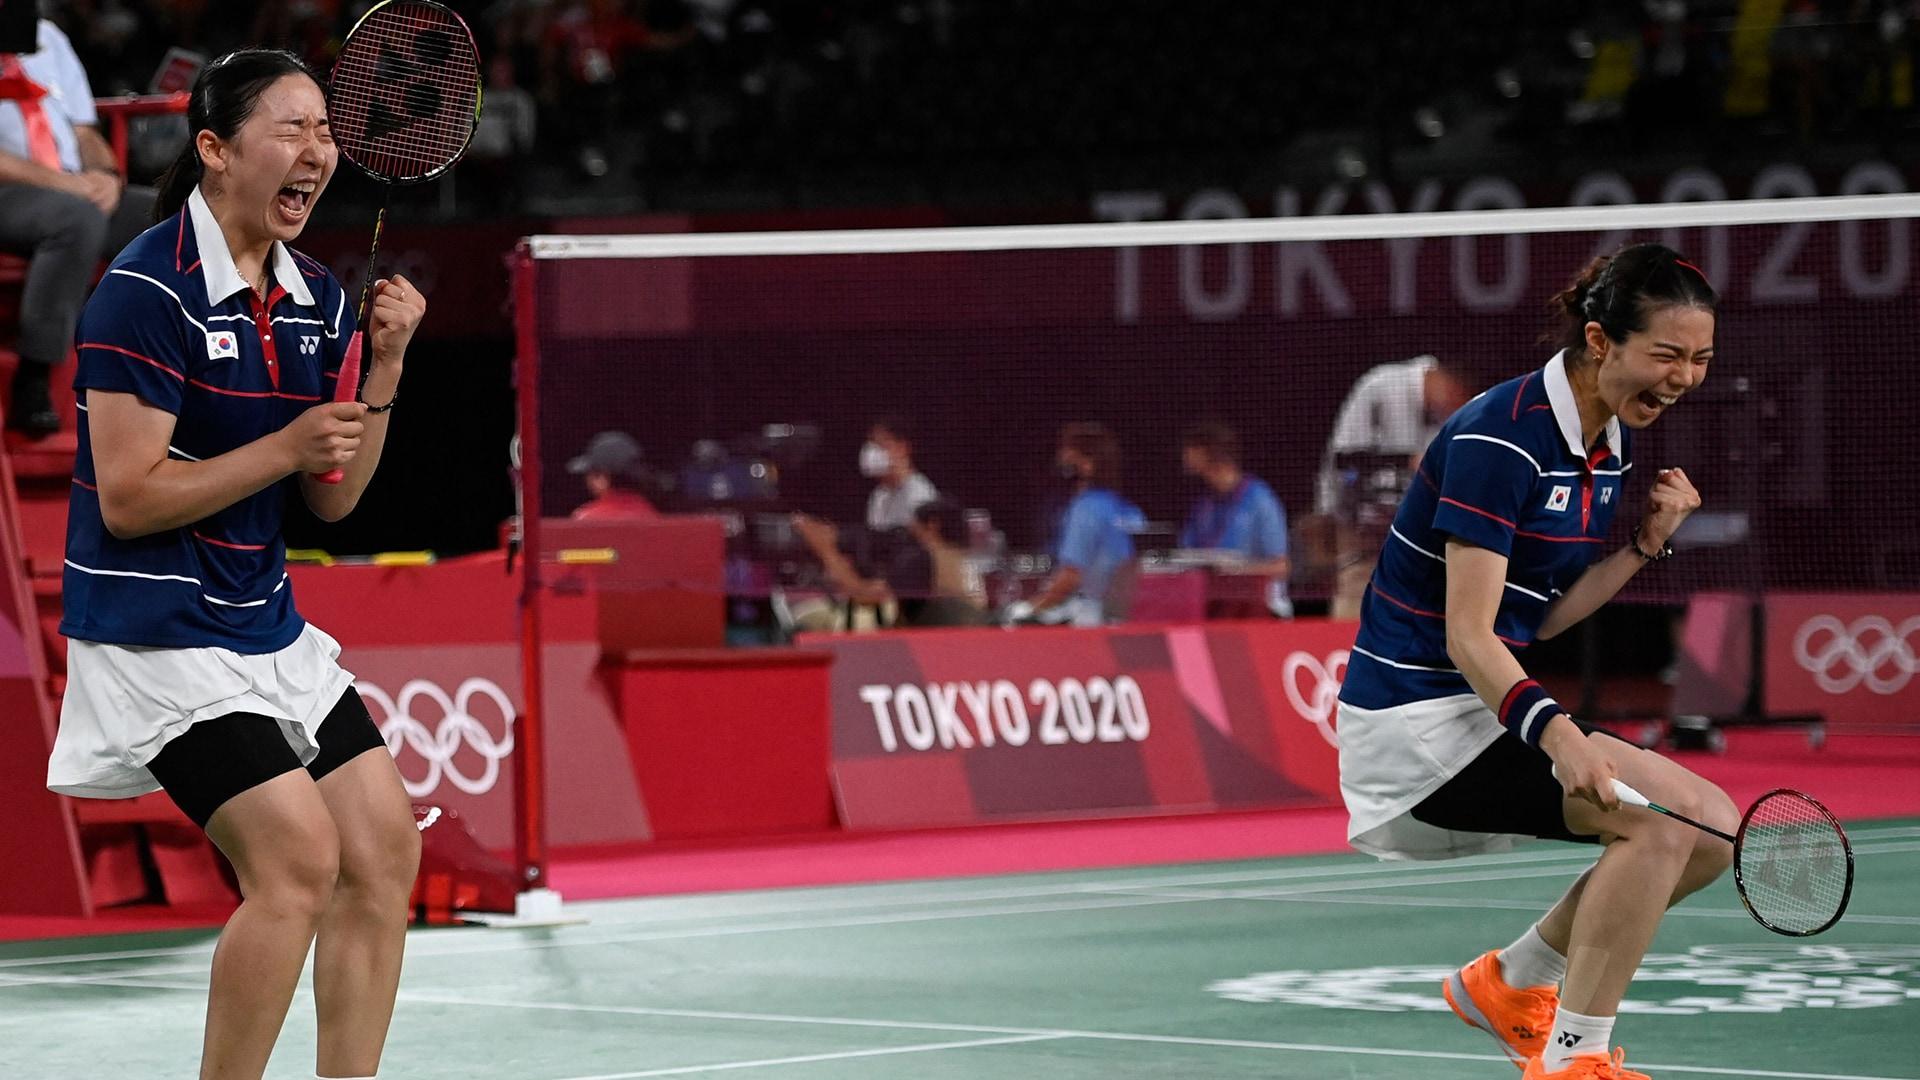 Image for South Korea outlasts Japan to score badminton women's doubles semifinal berth